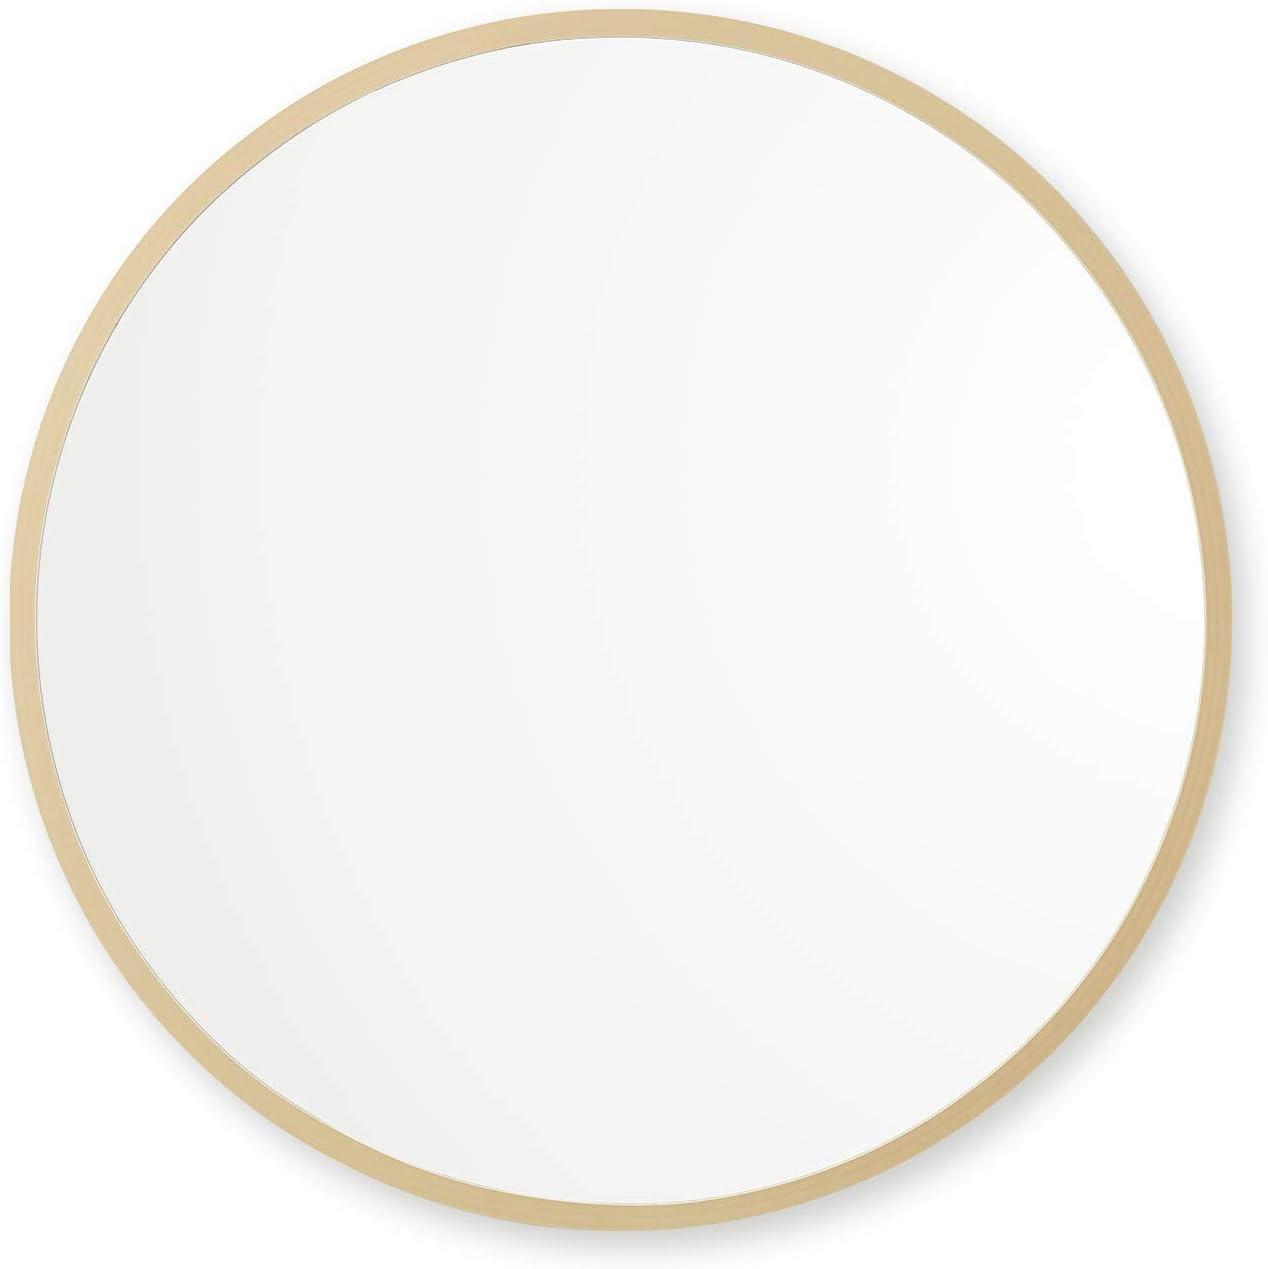 "Better Bevel 24"" x 24"" Matte Gold Rubber Framed Mirror | Round Bathroom Wall Mirror"